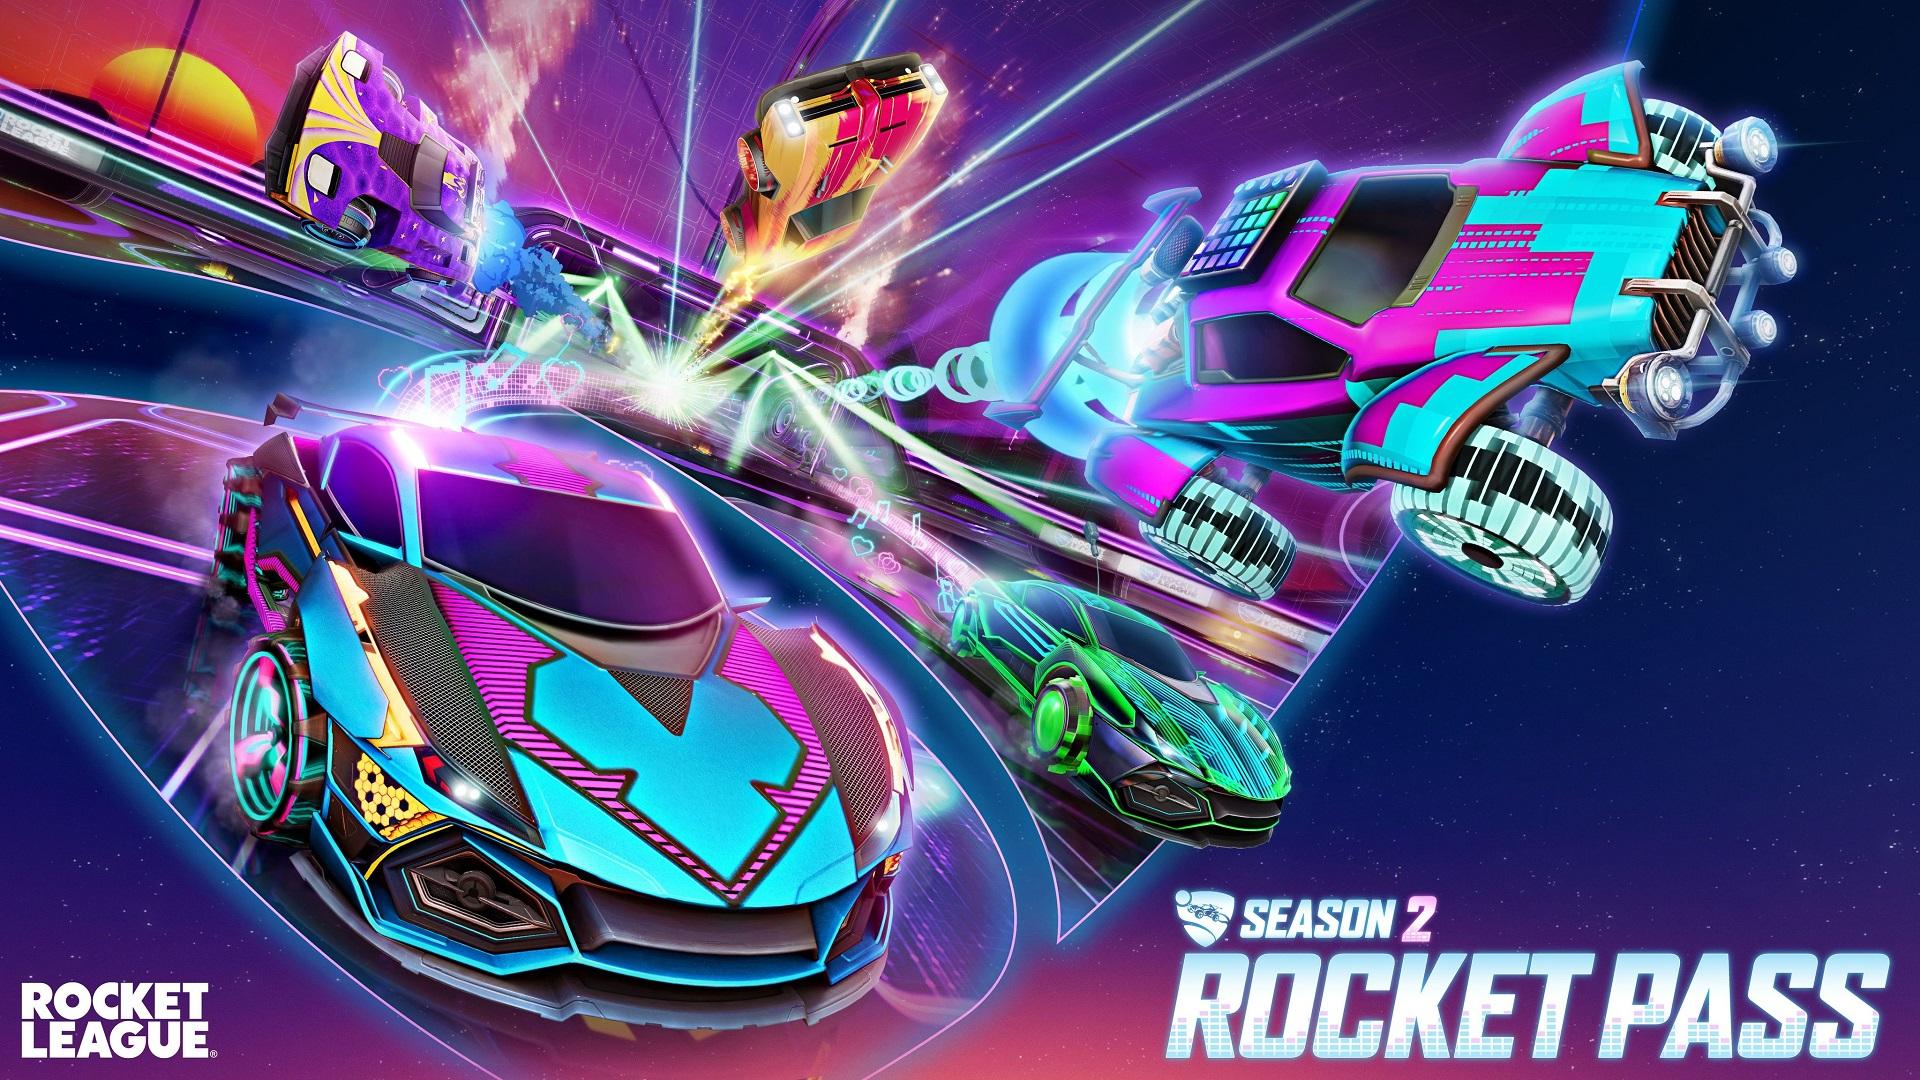 Rocket League Season 2 begins next week